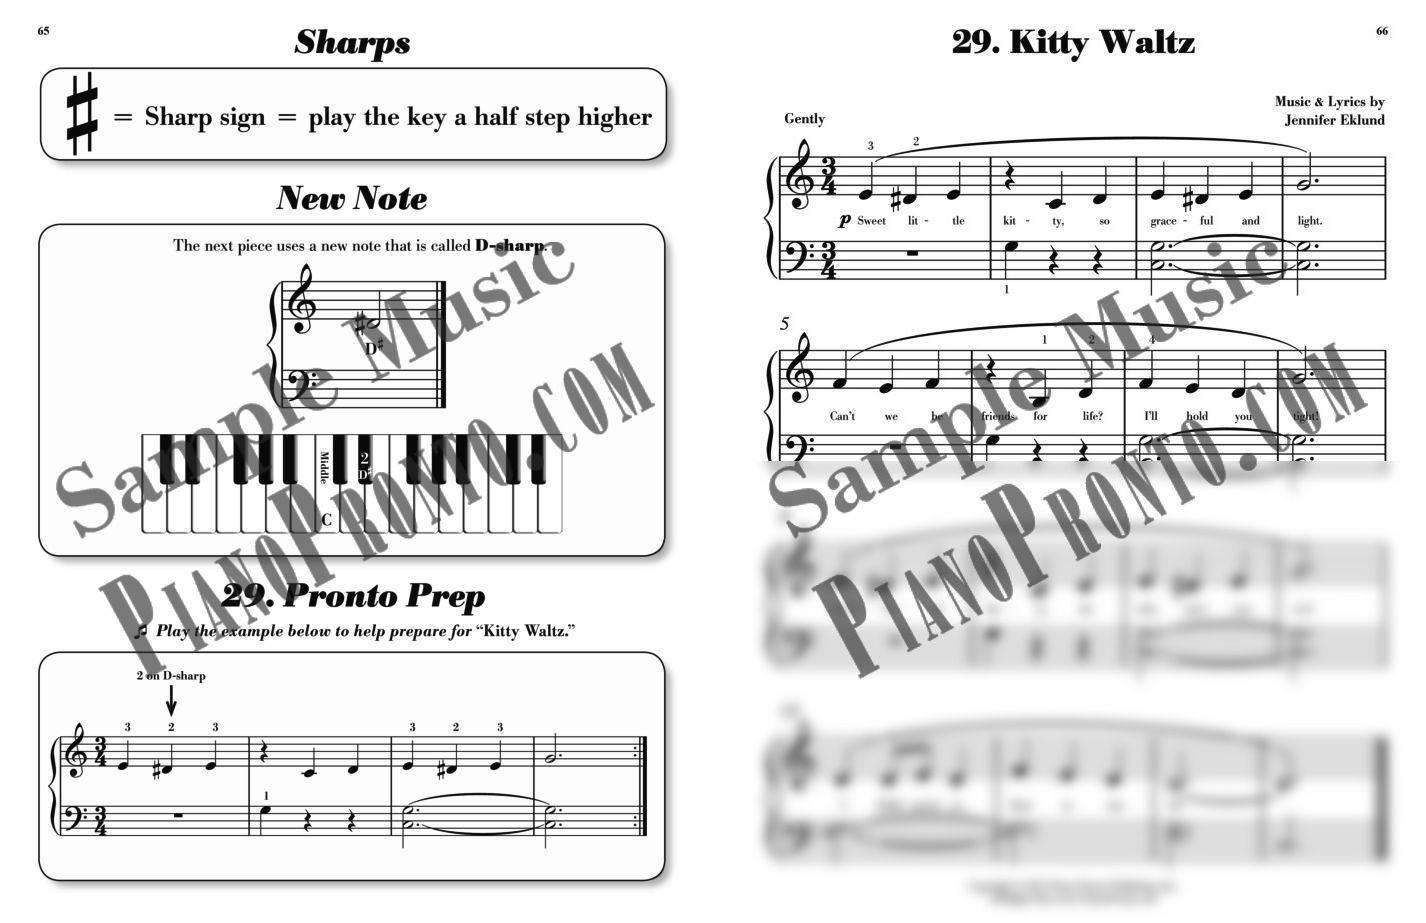 Piano Pronto®: Prelude | Hardcopy, Method Book | Piano Pronto Publishing